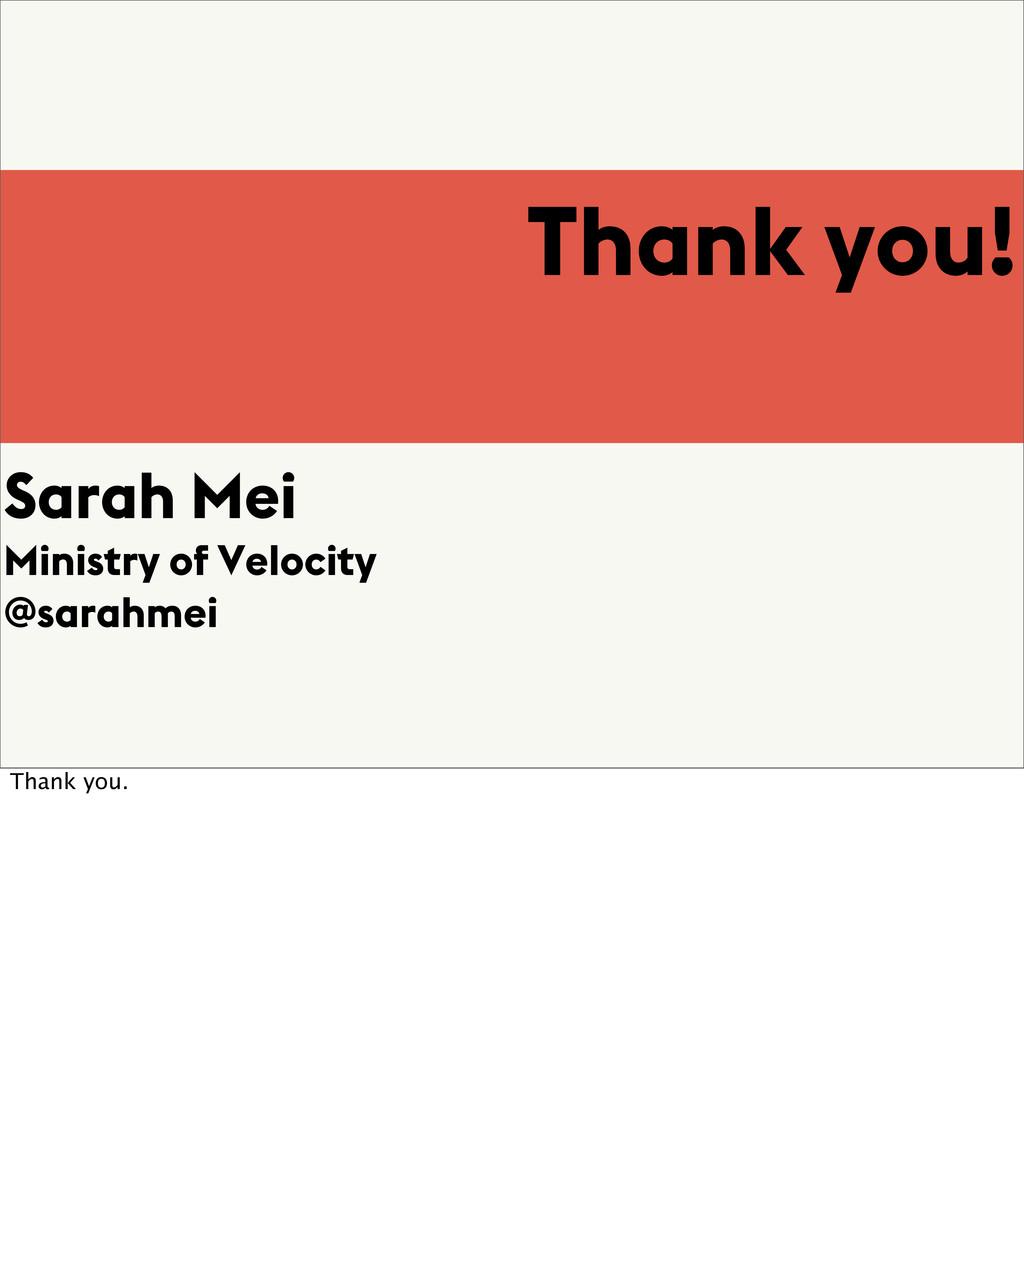 Thank you! Sarah Mei Ministry of Velocity @sara...